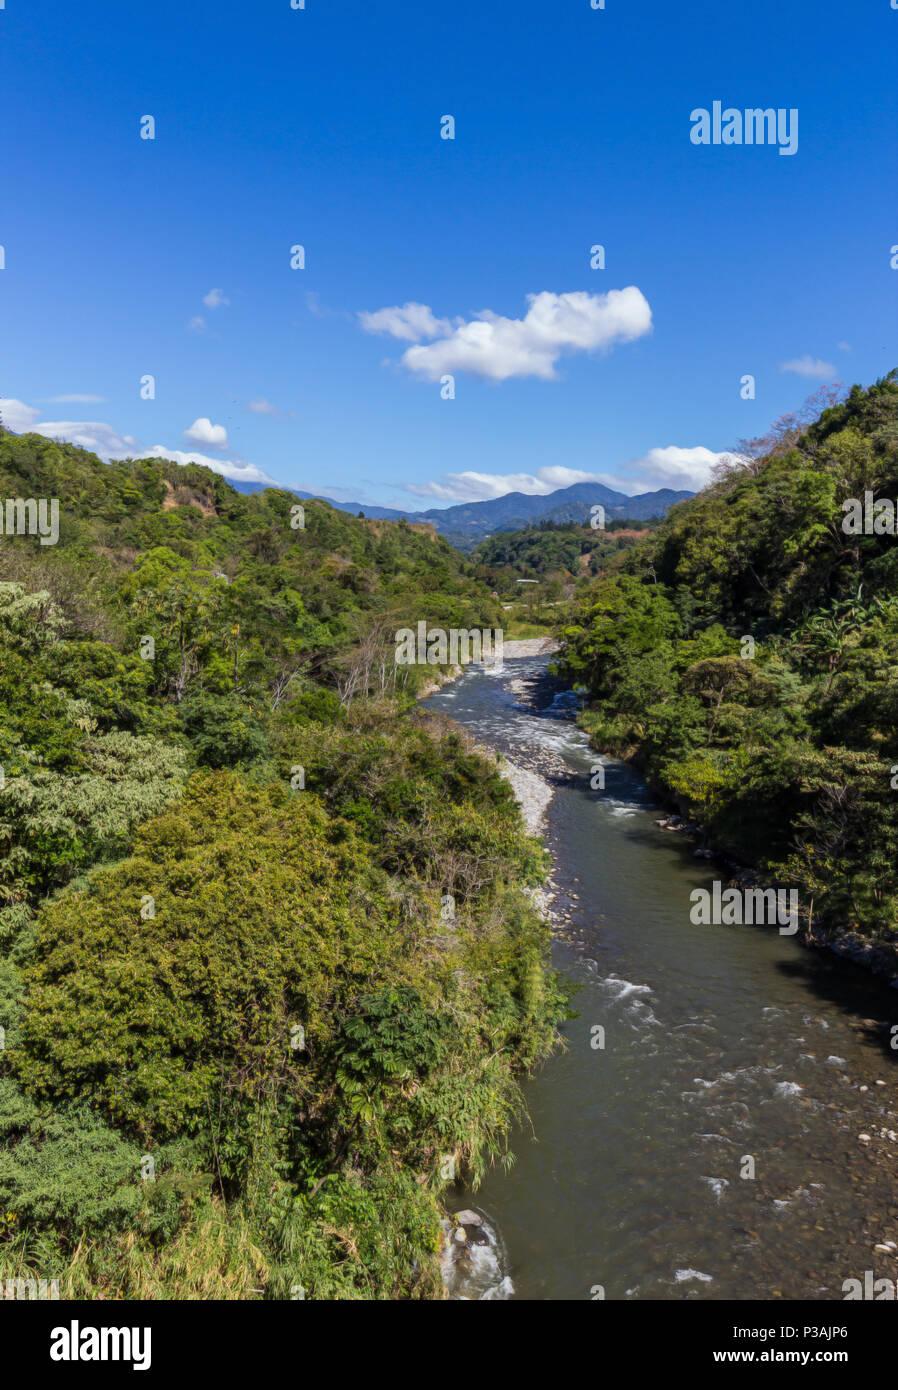 Caldera fiume in Chiriqui, Panama Immagini Stock